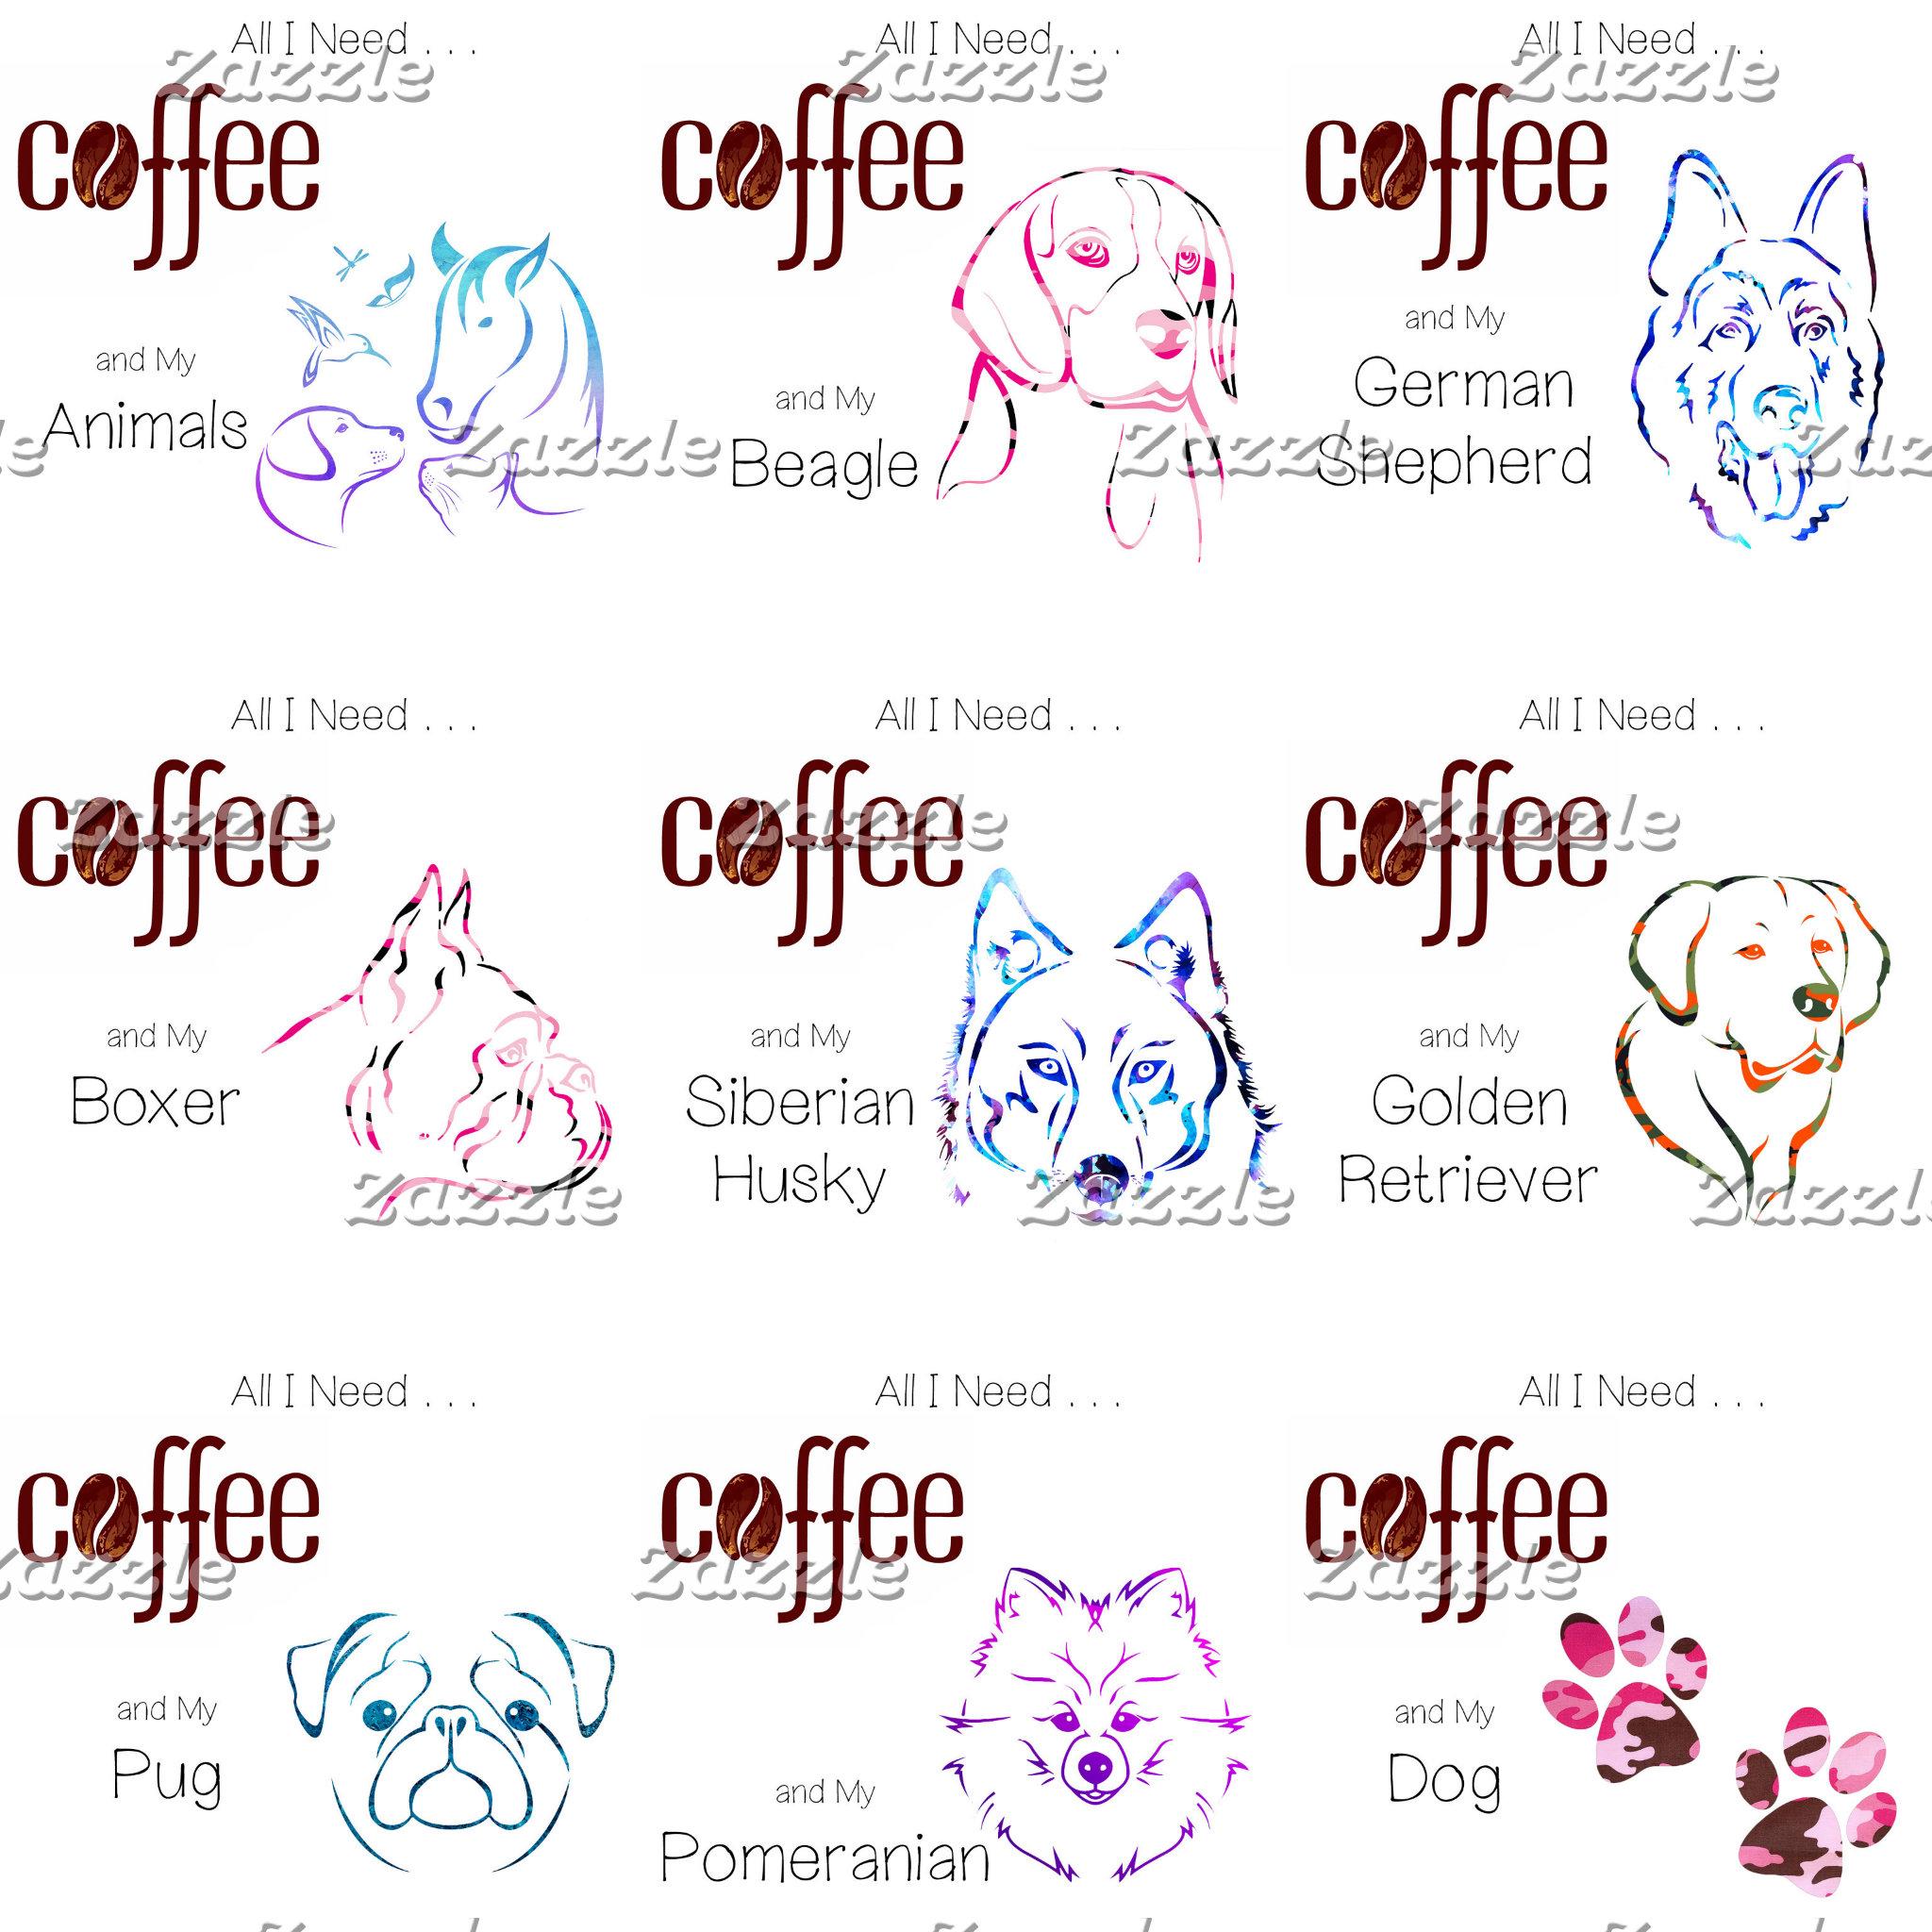 All I need is Coffee and My Dog - Dog Breed Mugs